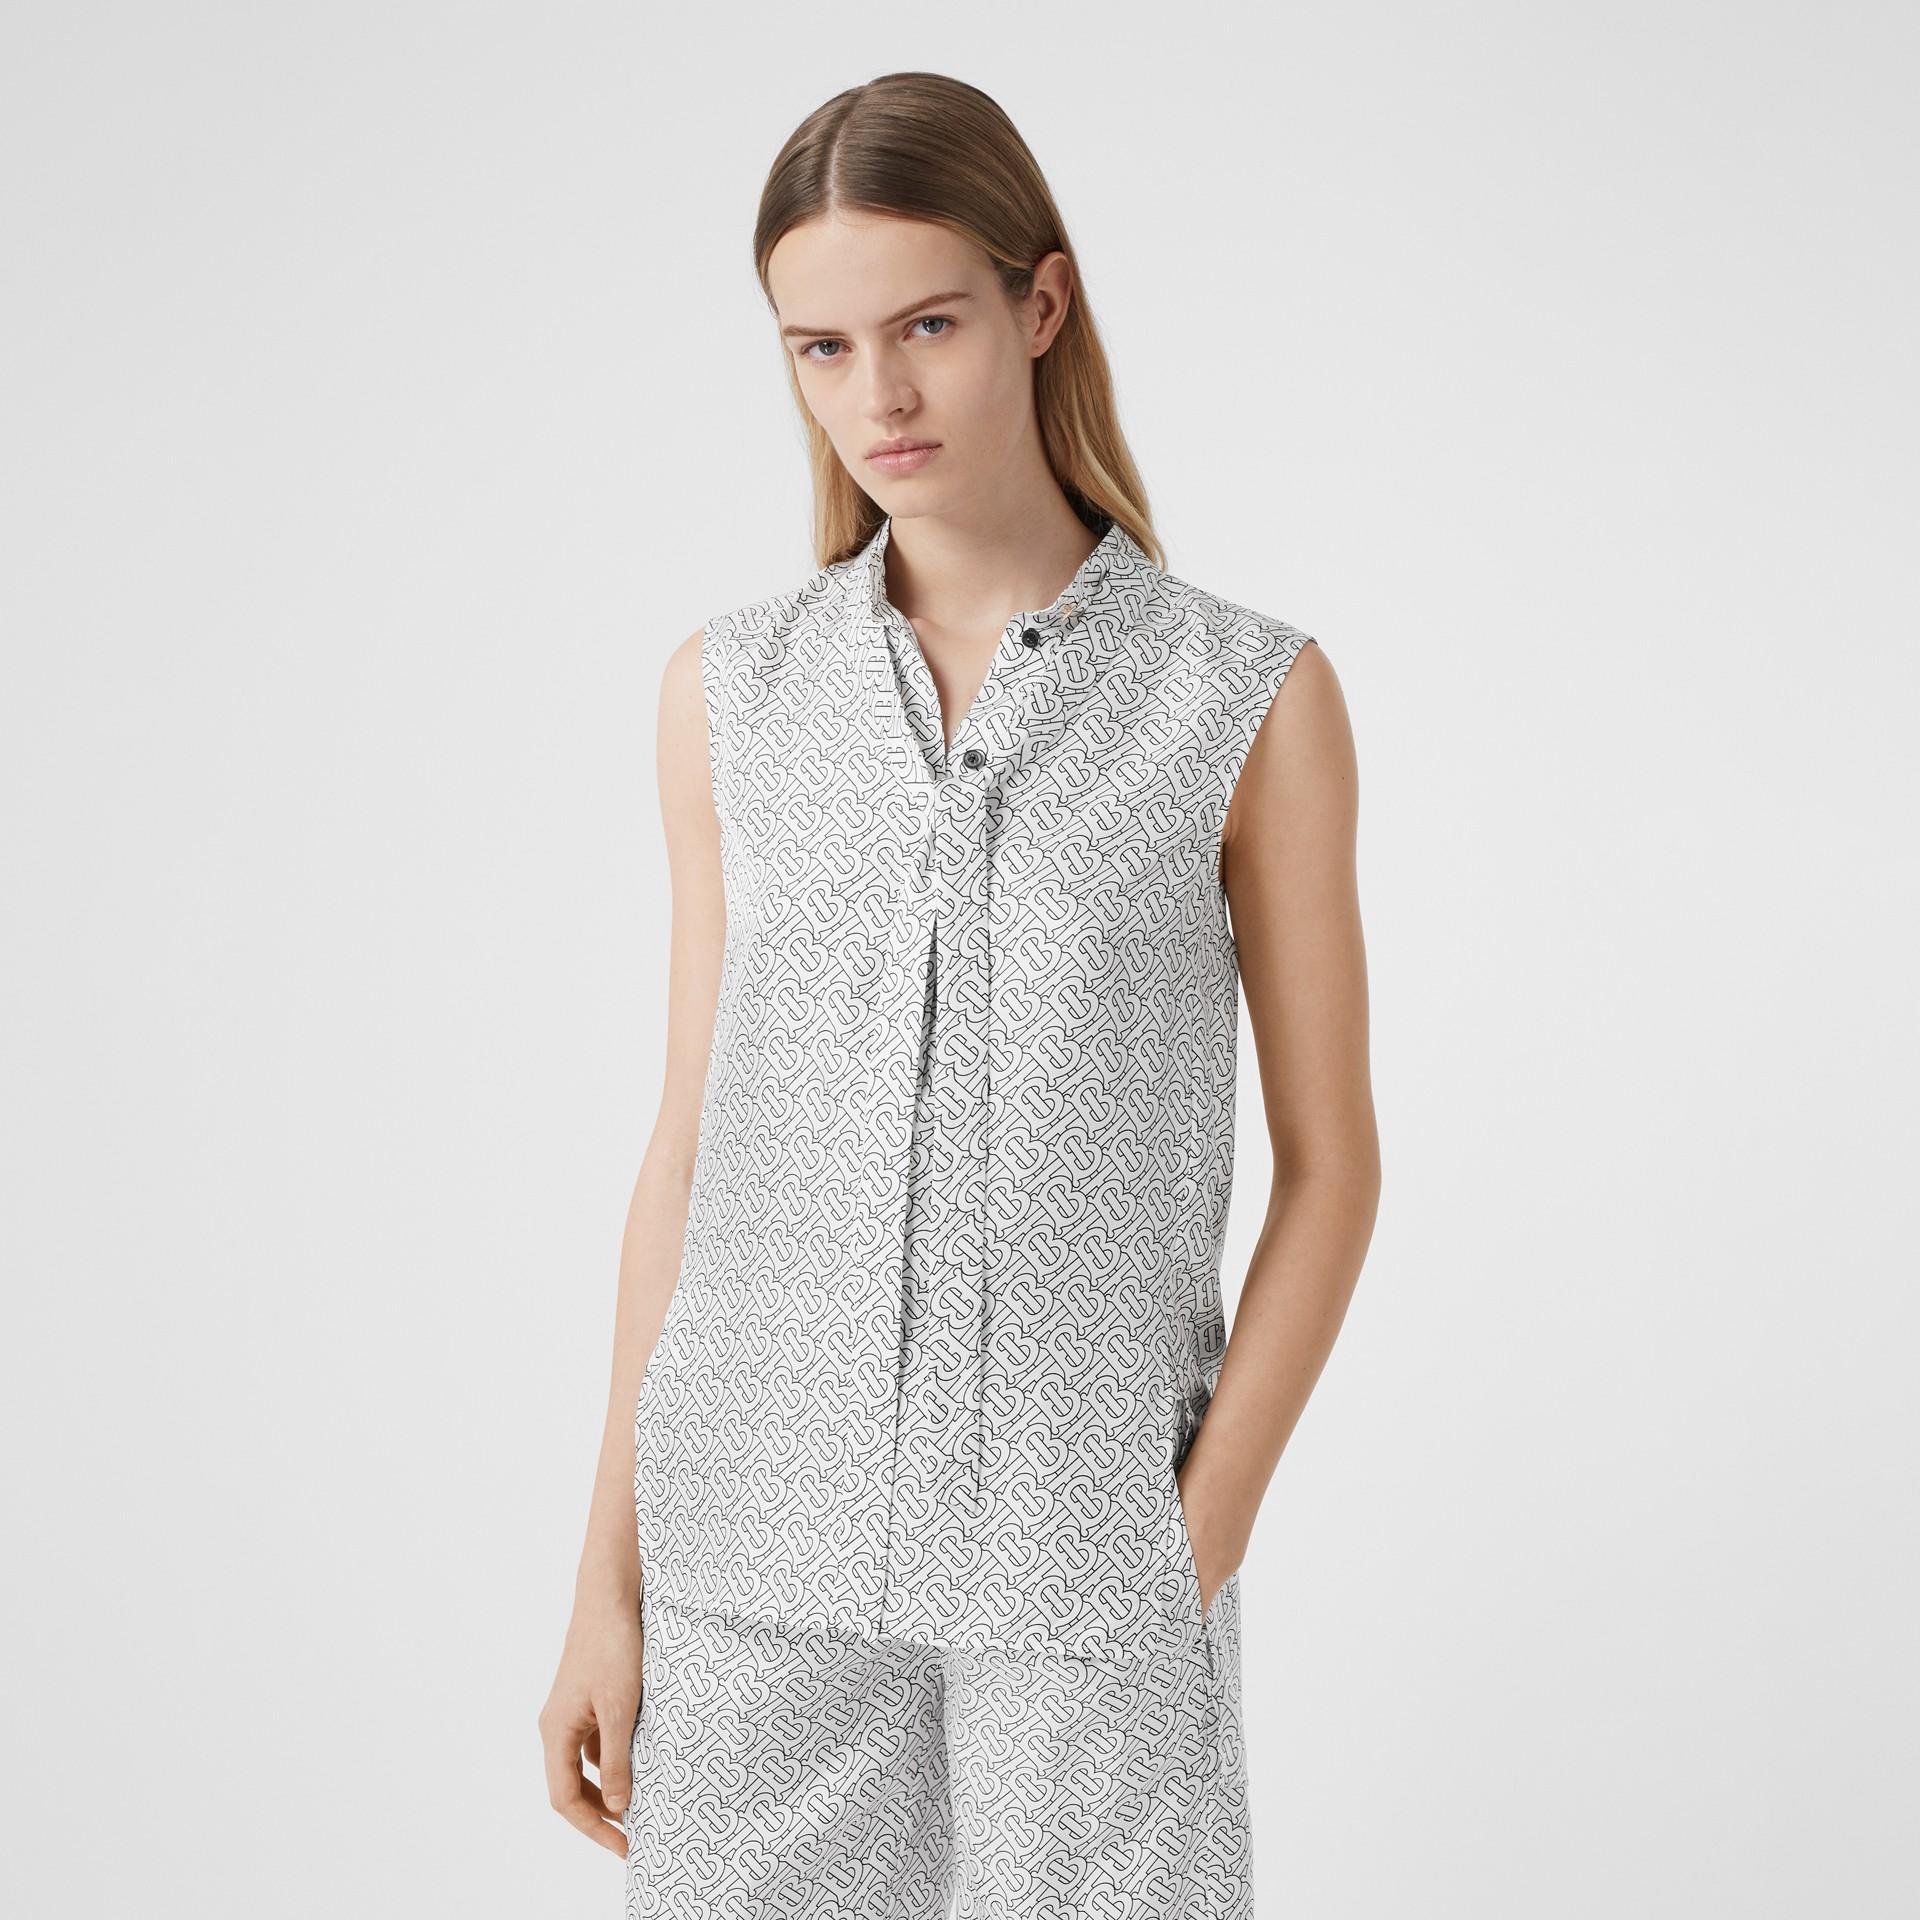 Sleeveless Monogram Print Silk Tie-neck Shirt in White - Women | Burberry - gallery image 4